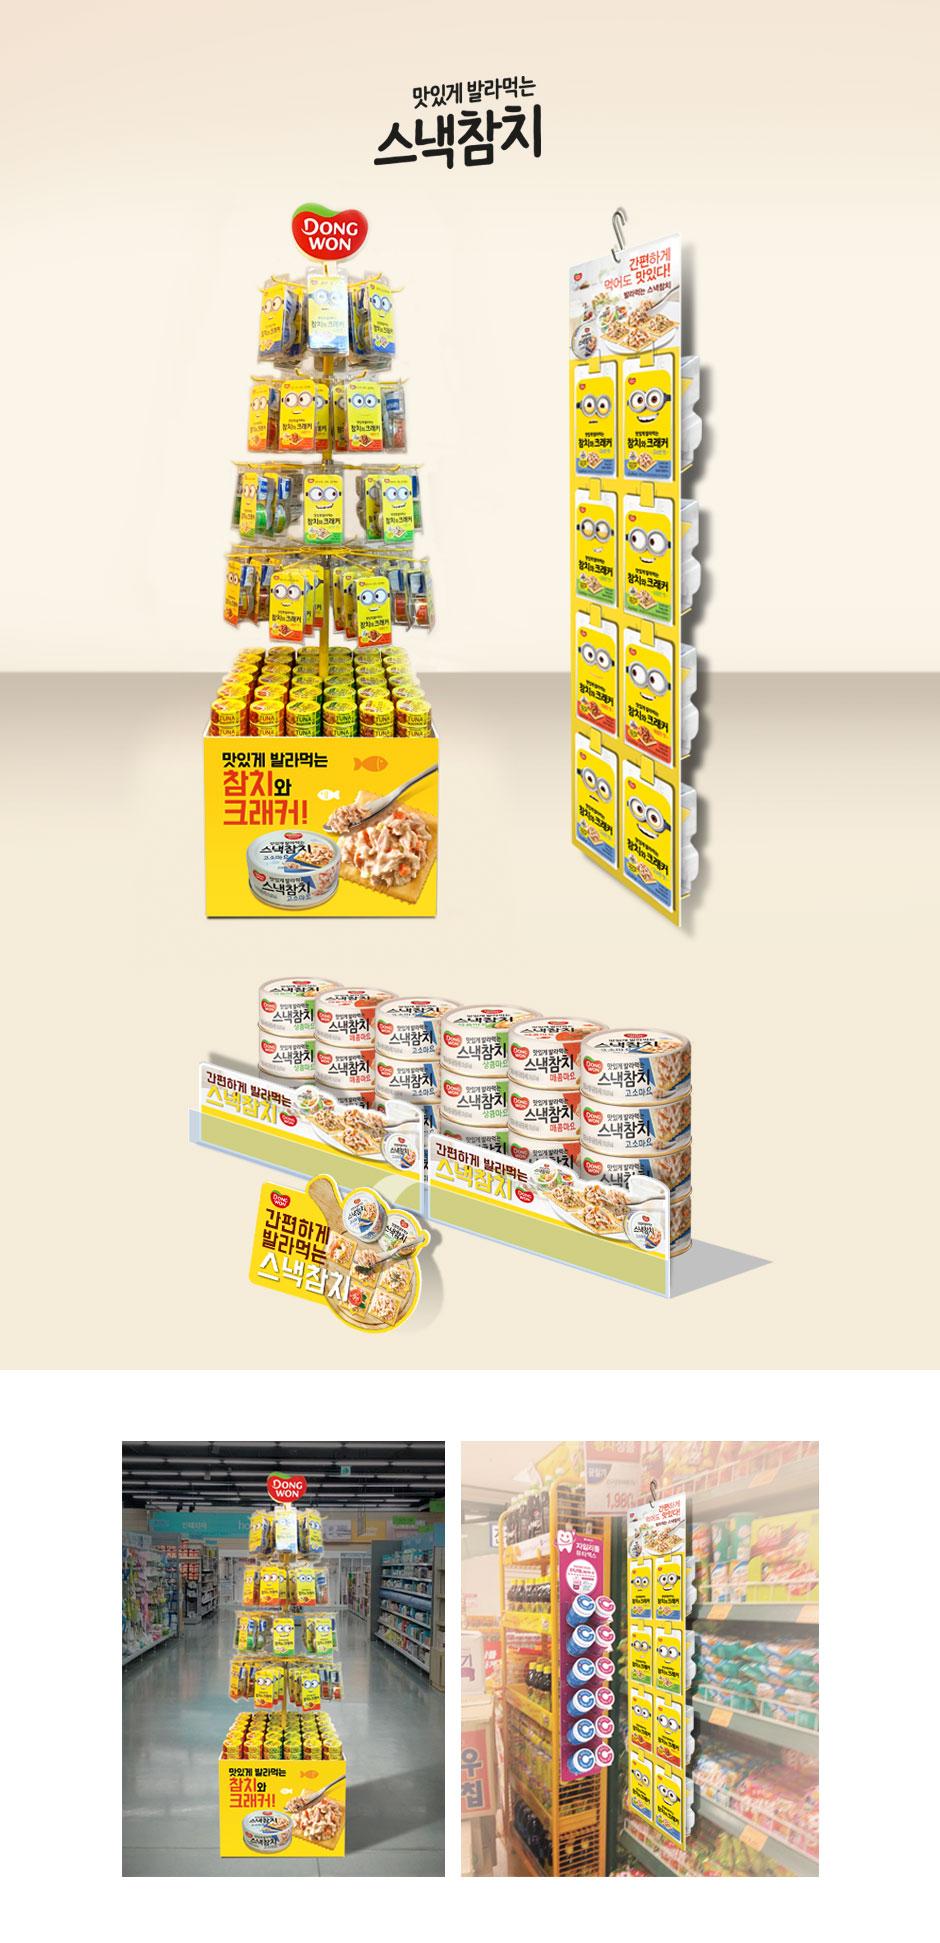 2018_Dongwon-FnB_Snack-Tuna_display-design